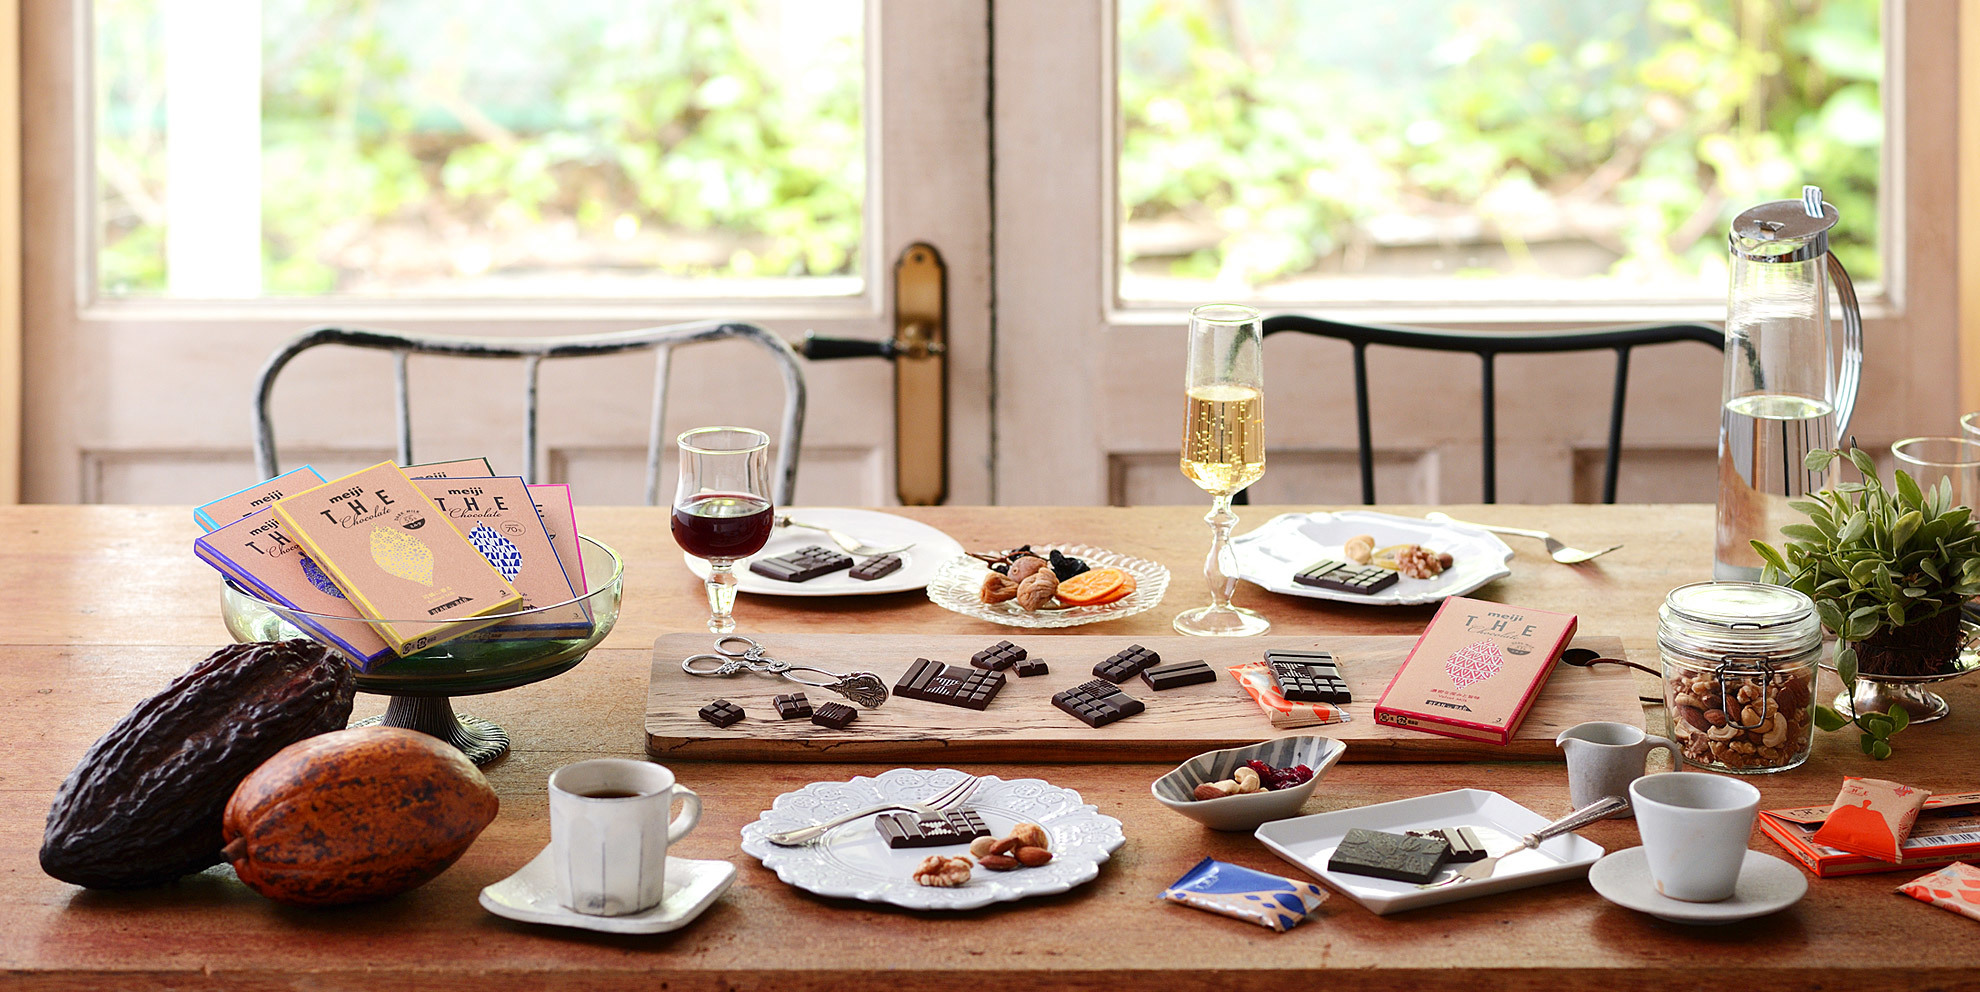 Meiji The Chocolate - from Meiji's website